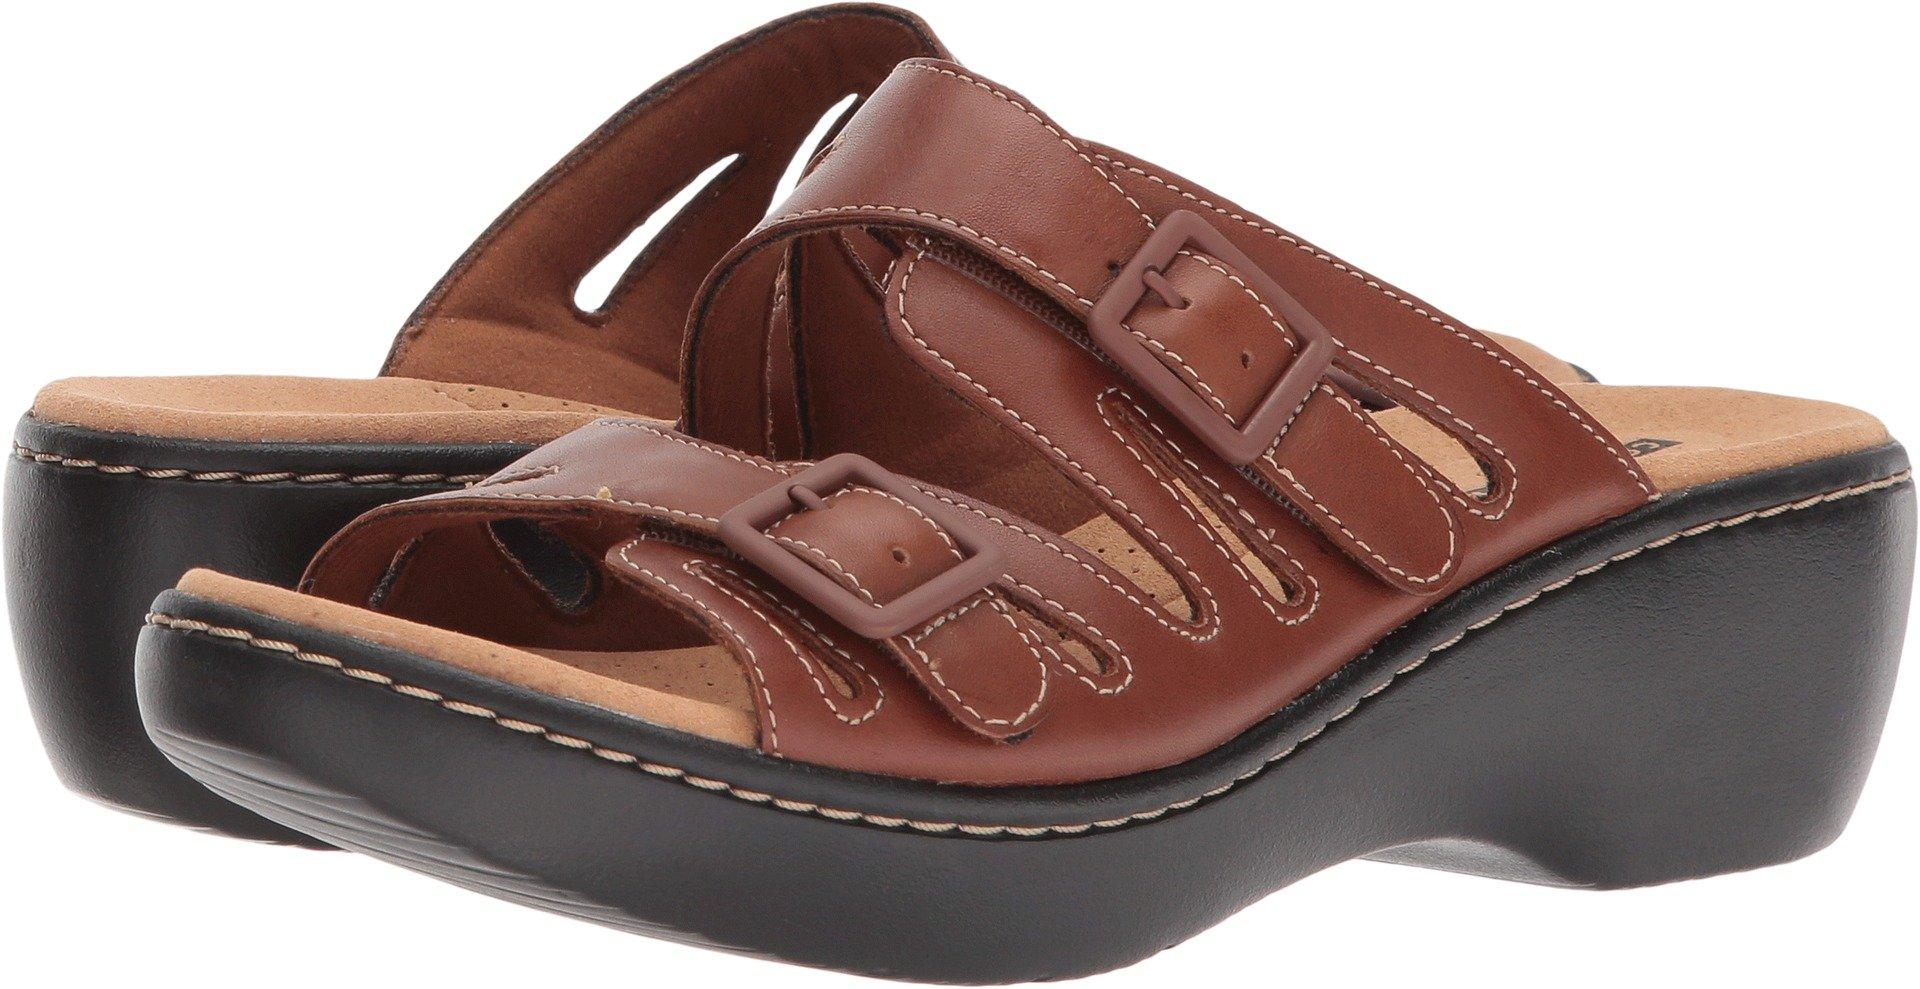 CLARKS Women's Delana Liri Platform, Dark tan Leather, 5 B(M) US